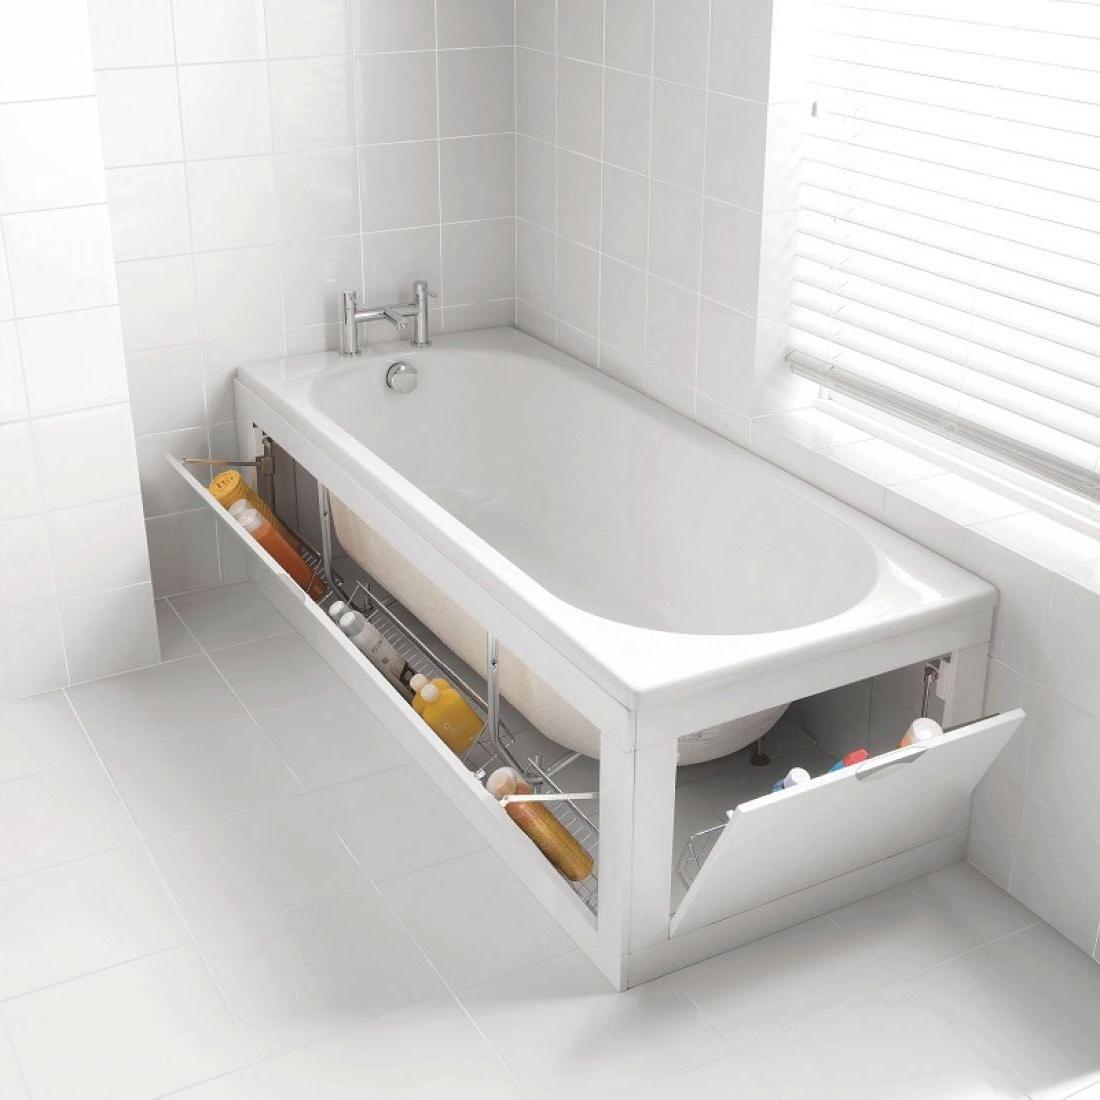 Bath under window ideas  image result for built in bath under window  bathroom inspiration